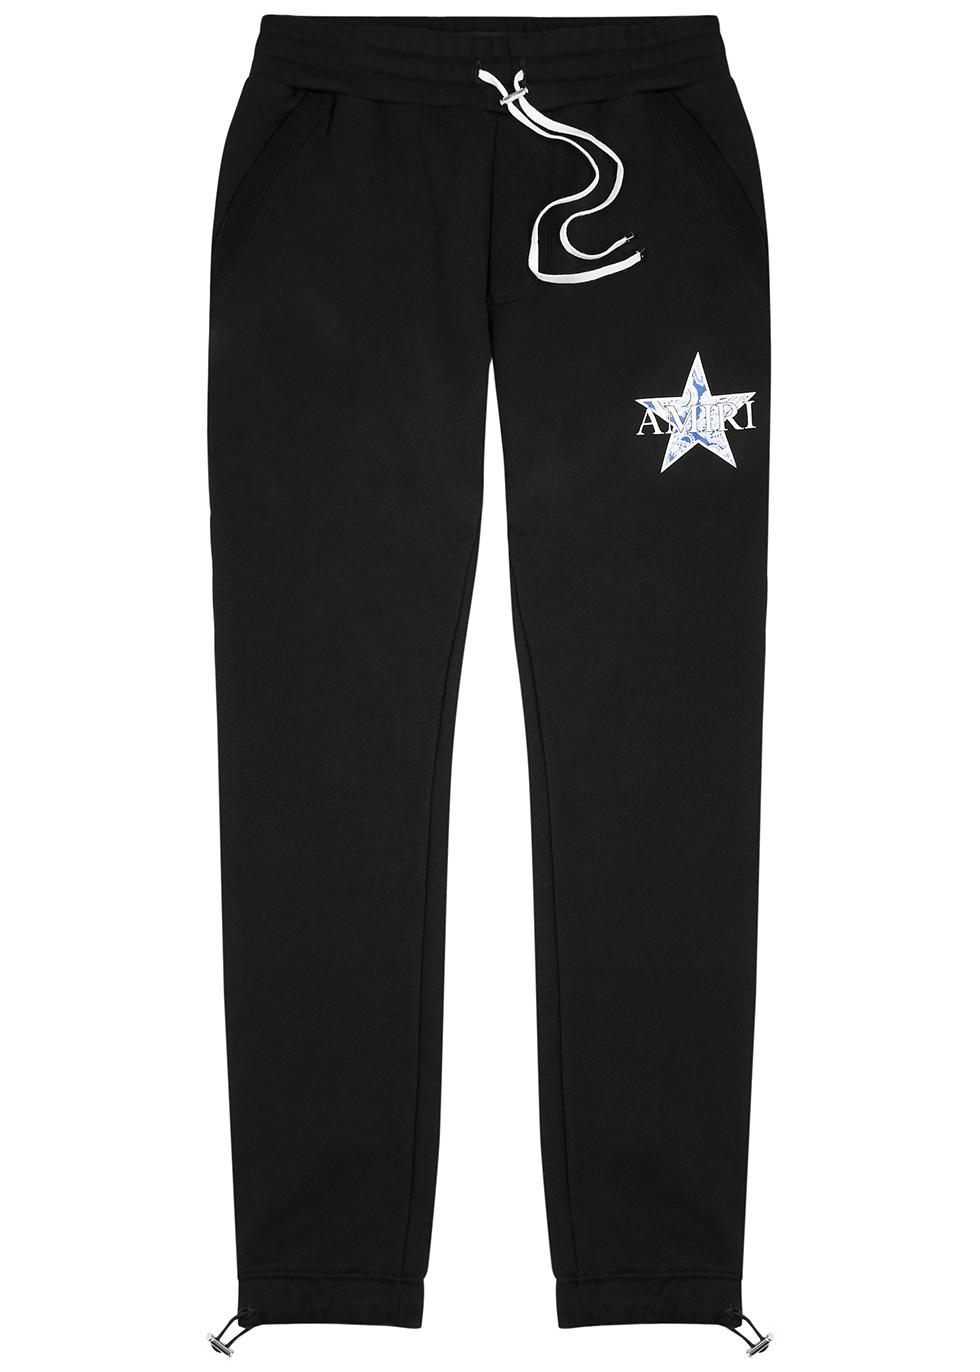 Black printed cotton sweatpants